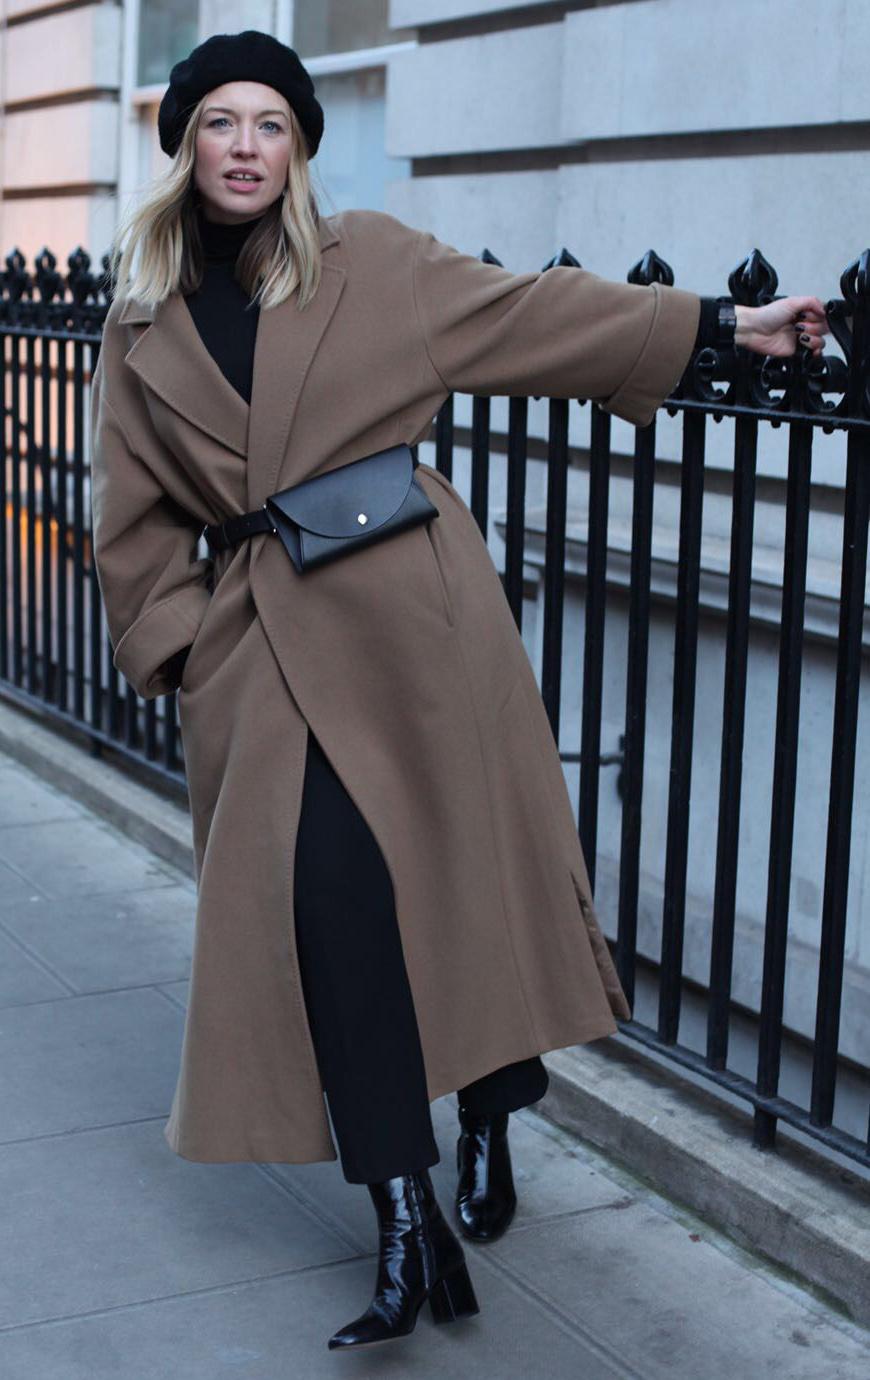 black-slim-pants-camel-jacket-coat-maxi-black-bag-fannypack-beret-hat-black-sweater-turtleneck-blonde-black-shoe-booties-fall-winter-weekend.jpg